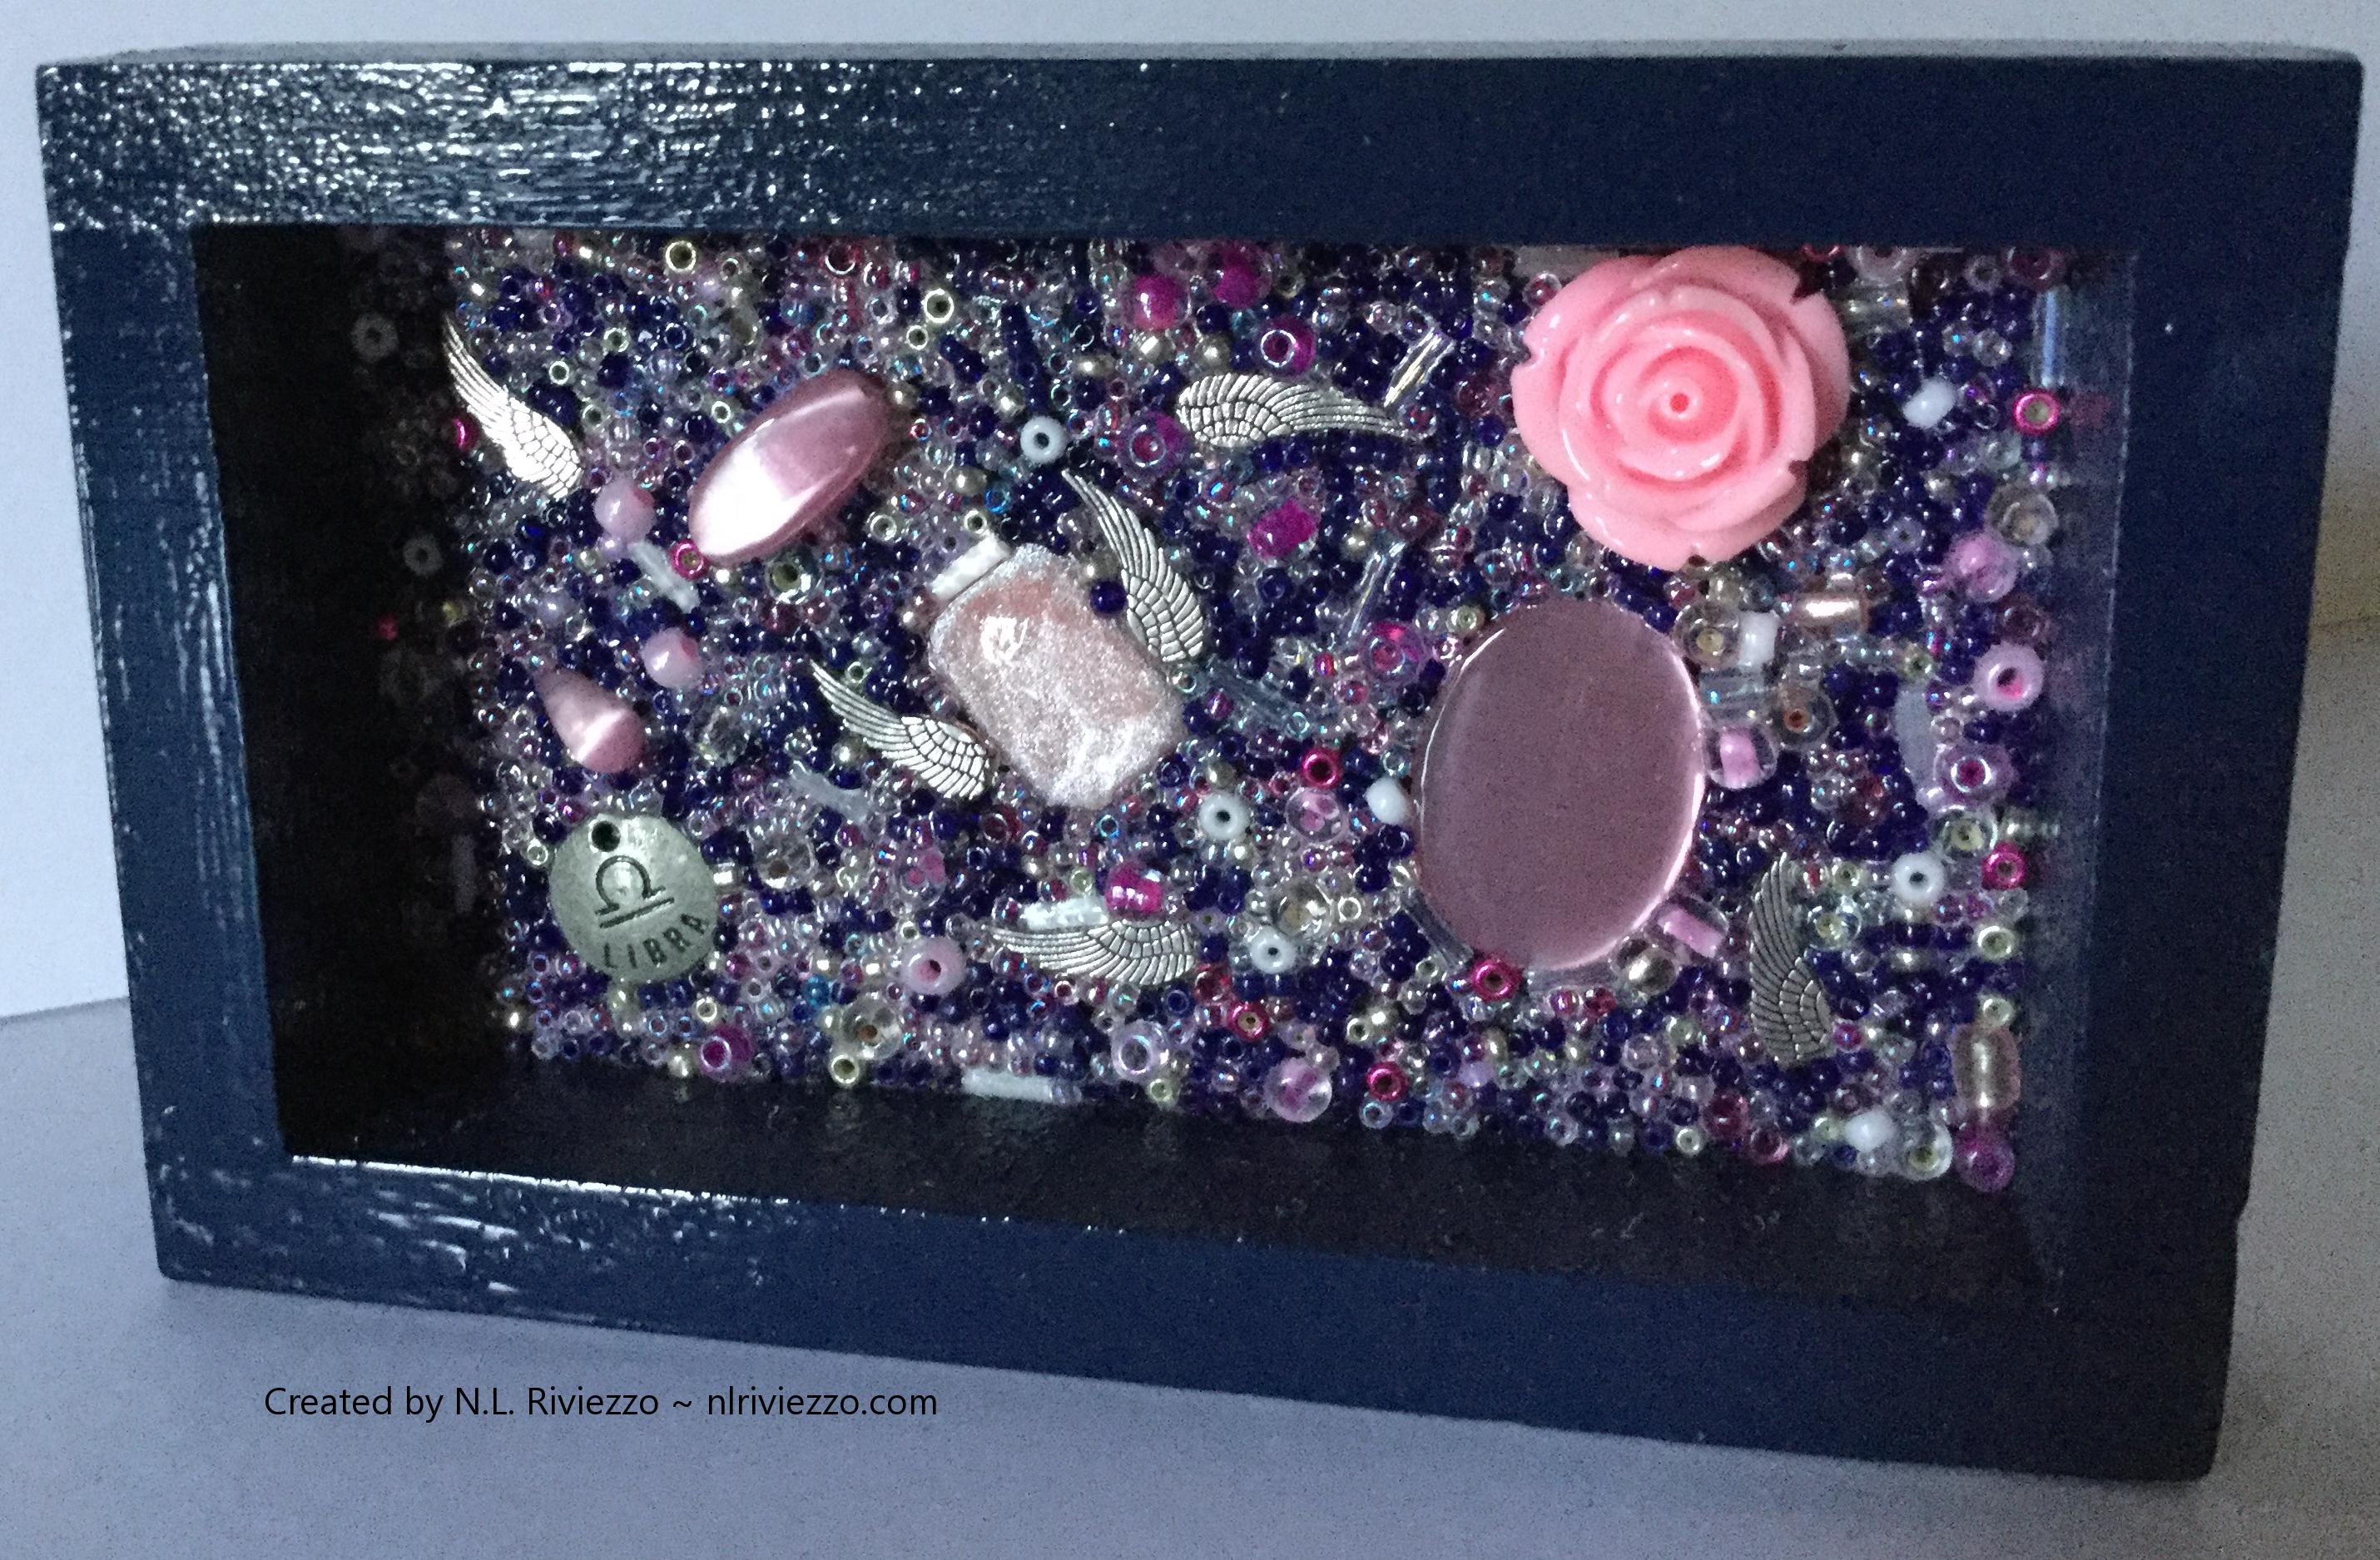 Libra: Air, Indigo Blue, Rose, and Quicksilver